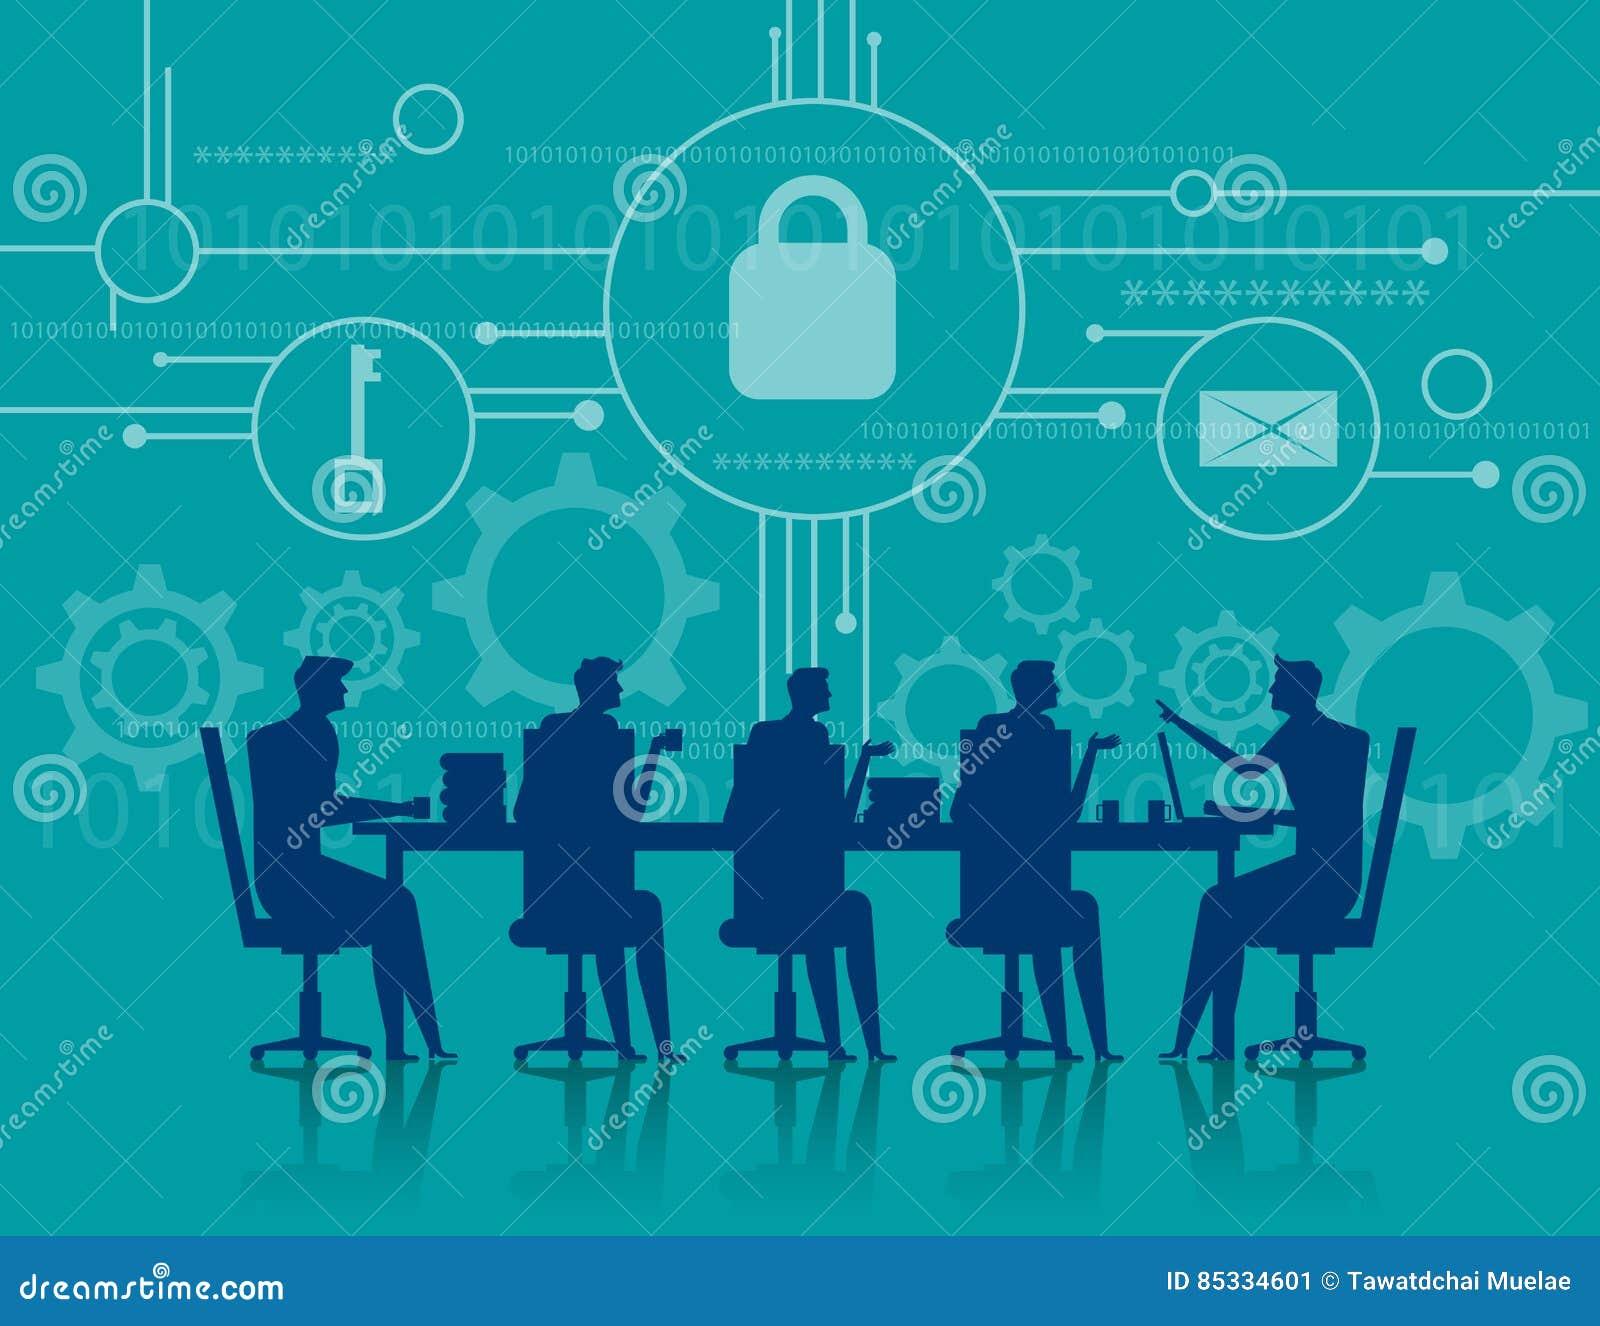 CyberSecurity 业务会议安全 概念企业illus